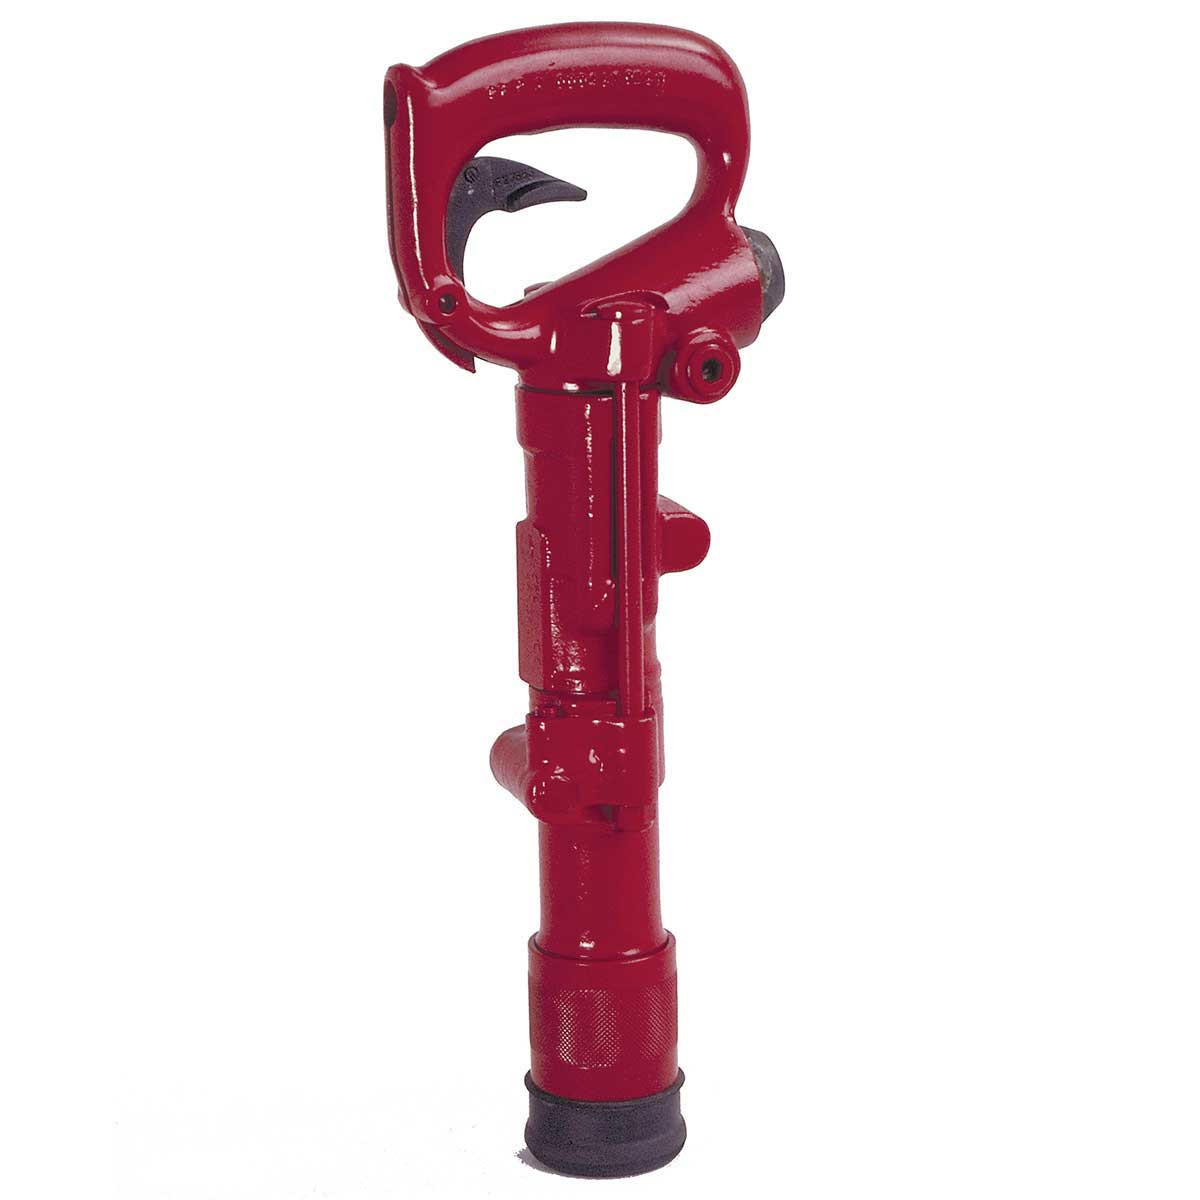 T022083 Round Combi Drill Hammer